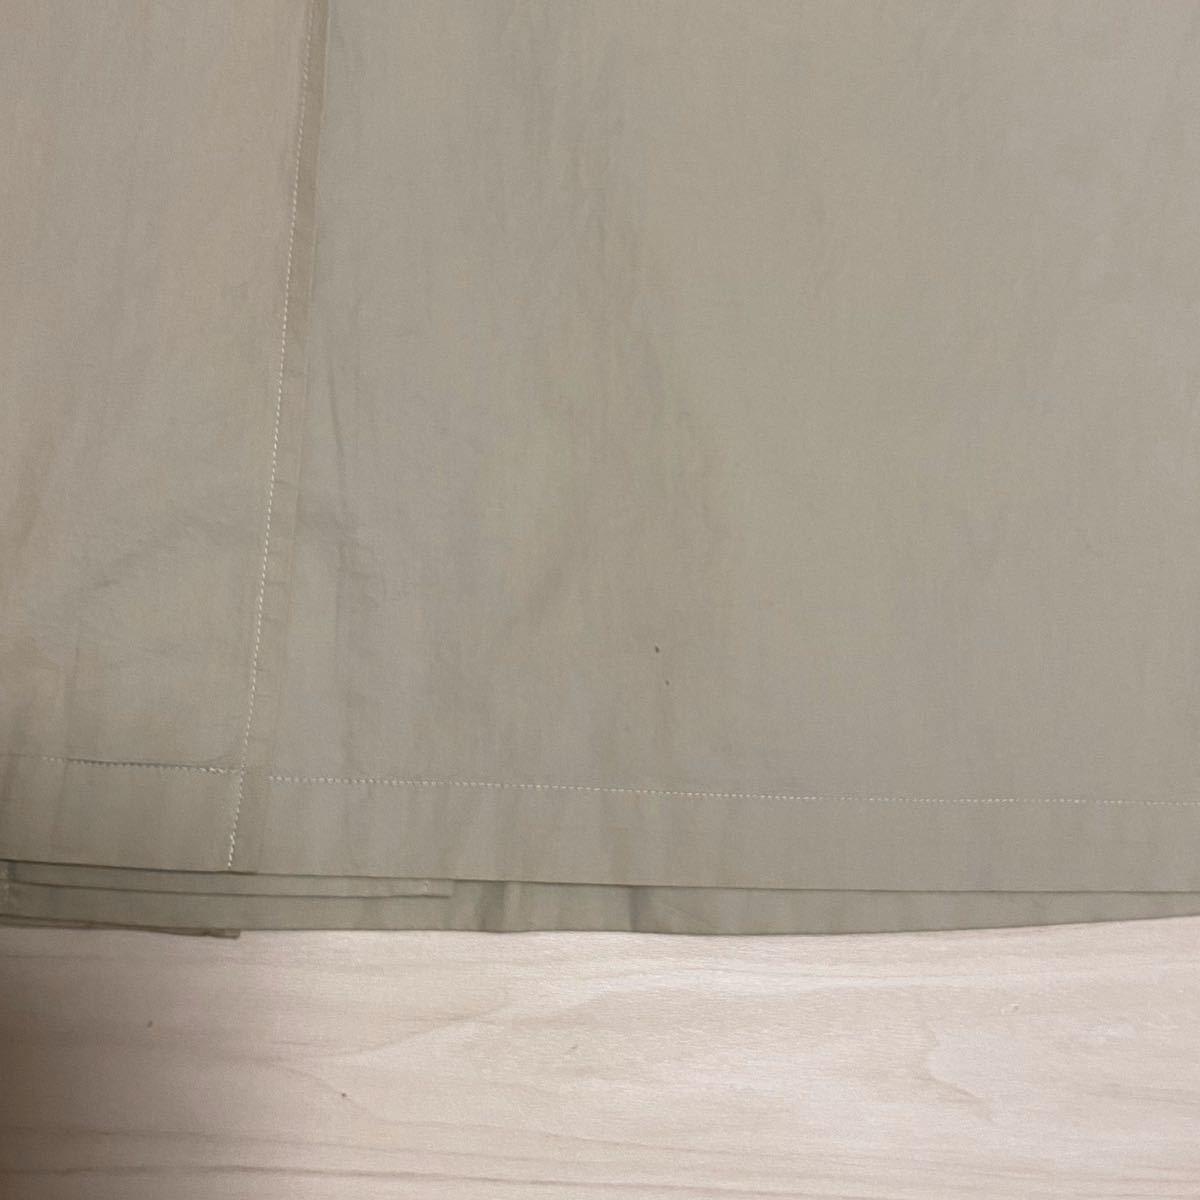 BURBERRY LONDON ステンカラーコート 裏地ノバチェック 日本製 ベージュ 三陽商会 バーバリーロンドン 比翼 175 薄手 ゆったり 背抜き_画像8